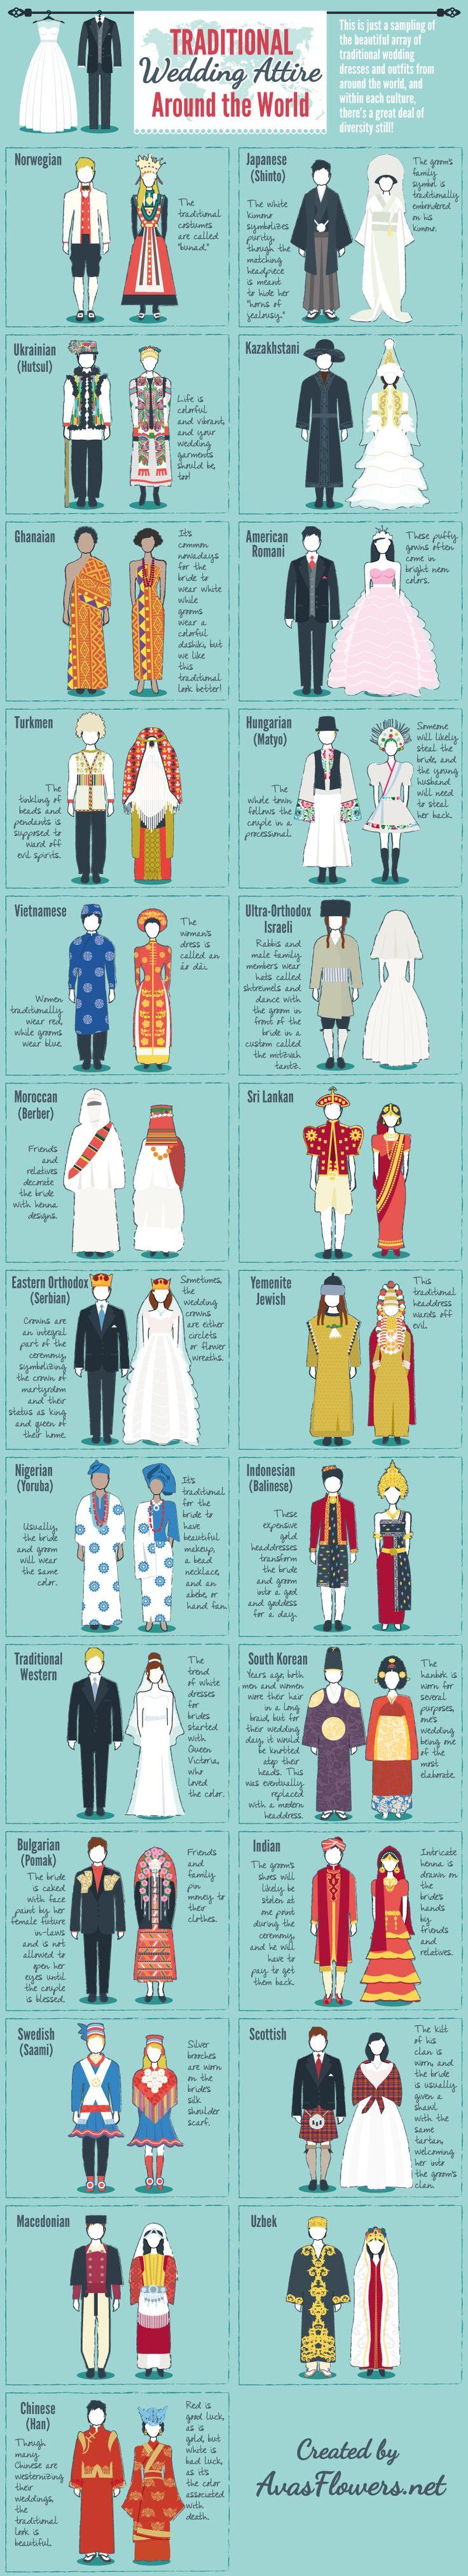 Traditional Wedding Attire Around the World